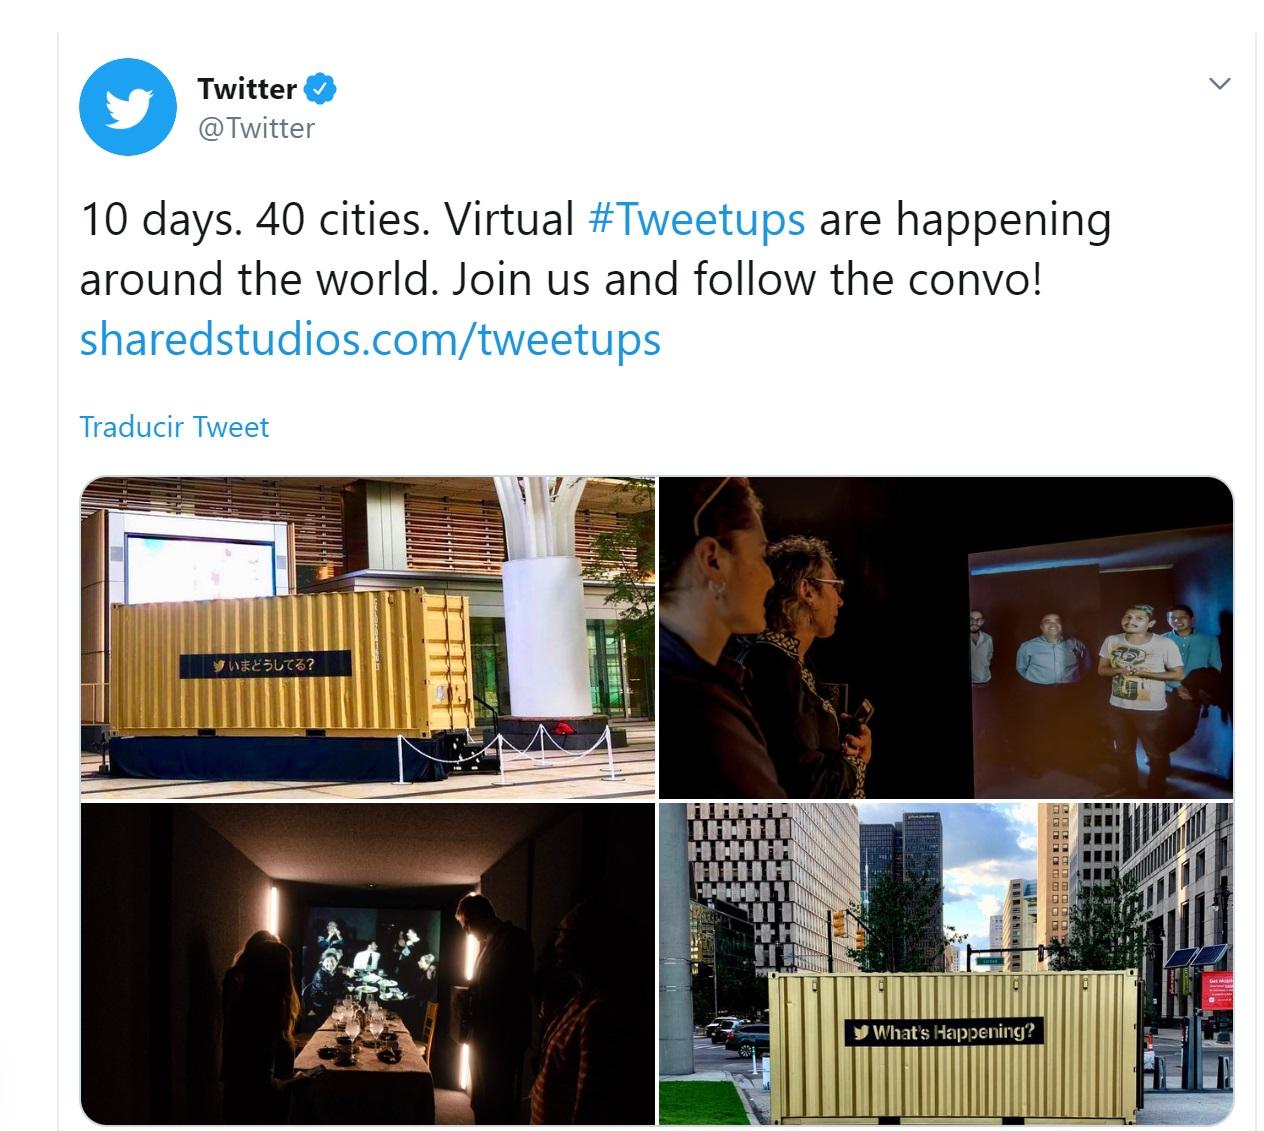 https://www.programapublicidad.com/wp-content/uploads/2019/07/Tweetups-twitter-campaña-graficas-programapublicidad-muy-grande.jpg